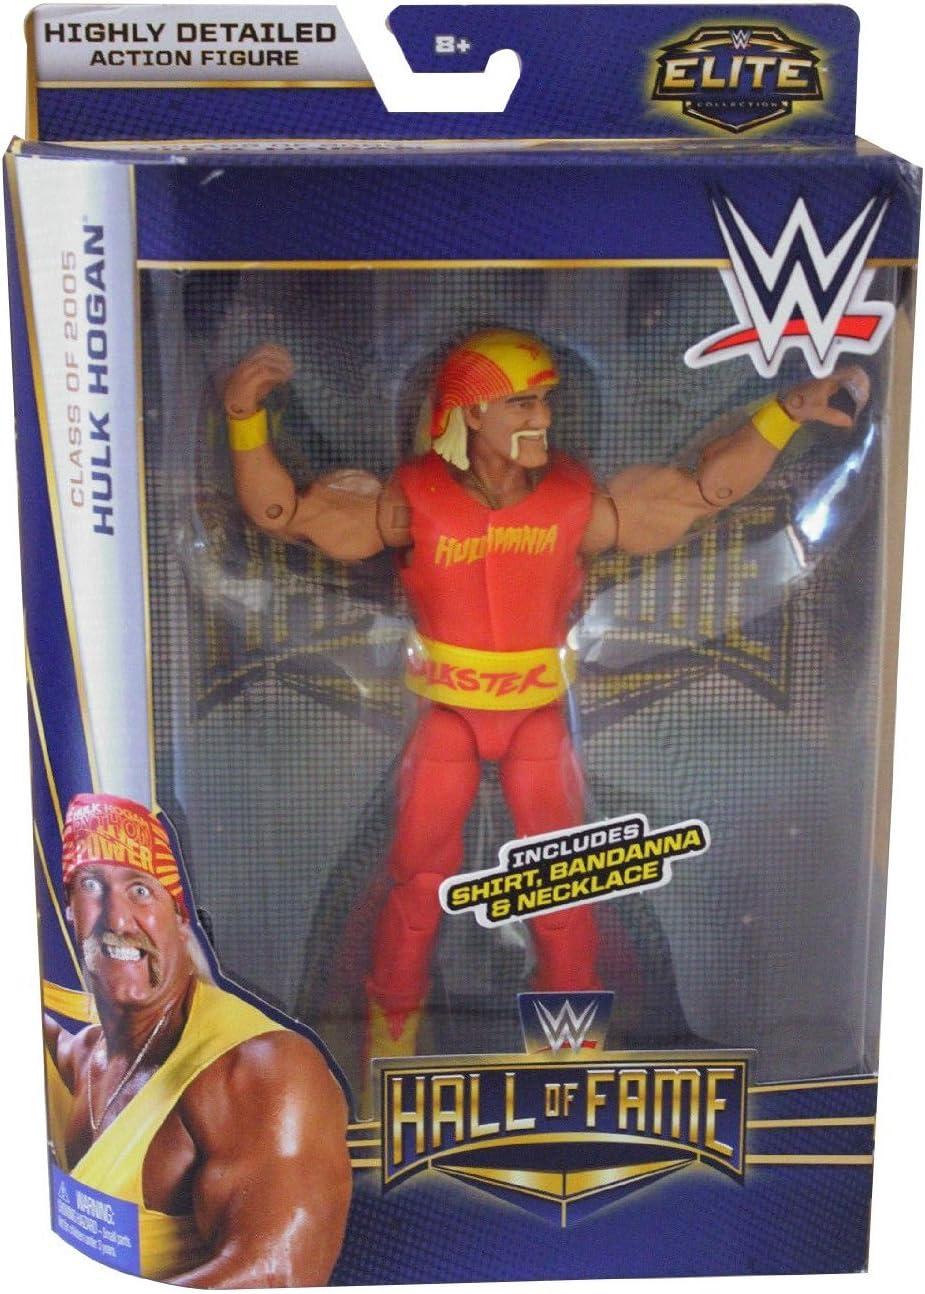 Amazon Com Mattel Wwe Elite Hall Of Fame Hulk Hogan Class Of 2005 Toys Games